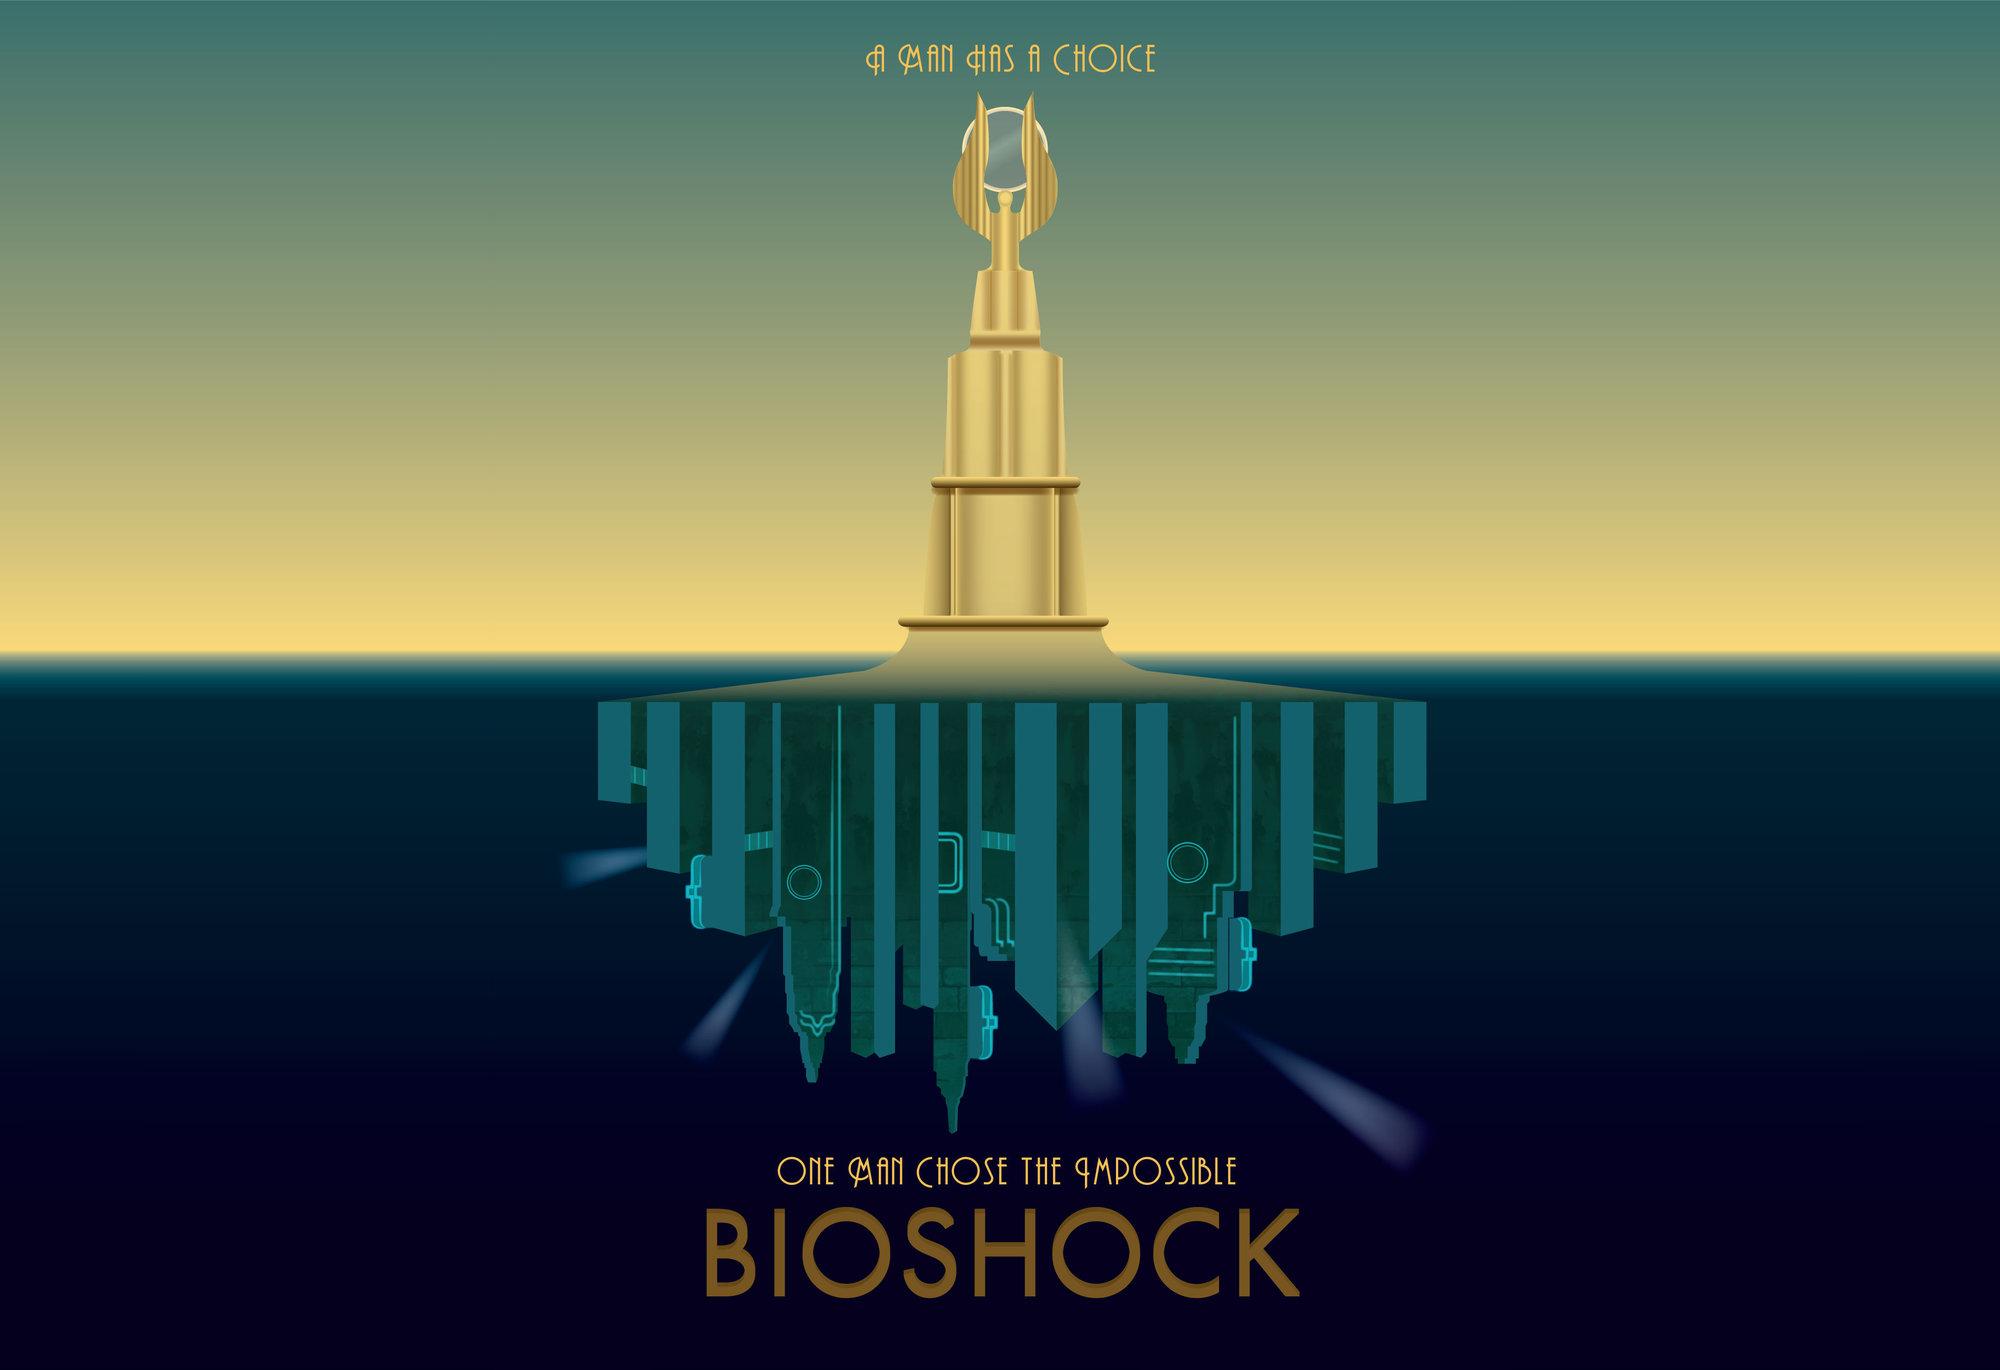 Bioshock Infinite Iphone Wallpaper Hd Hd Background Wallpaper 16 Hd Wallpapers Bioshock Bioshock Infinite Bioshock Art